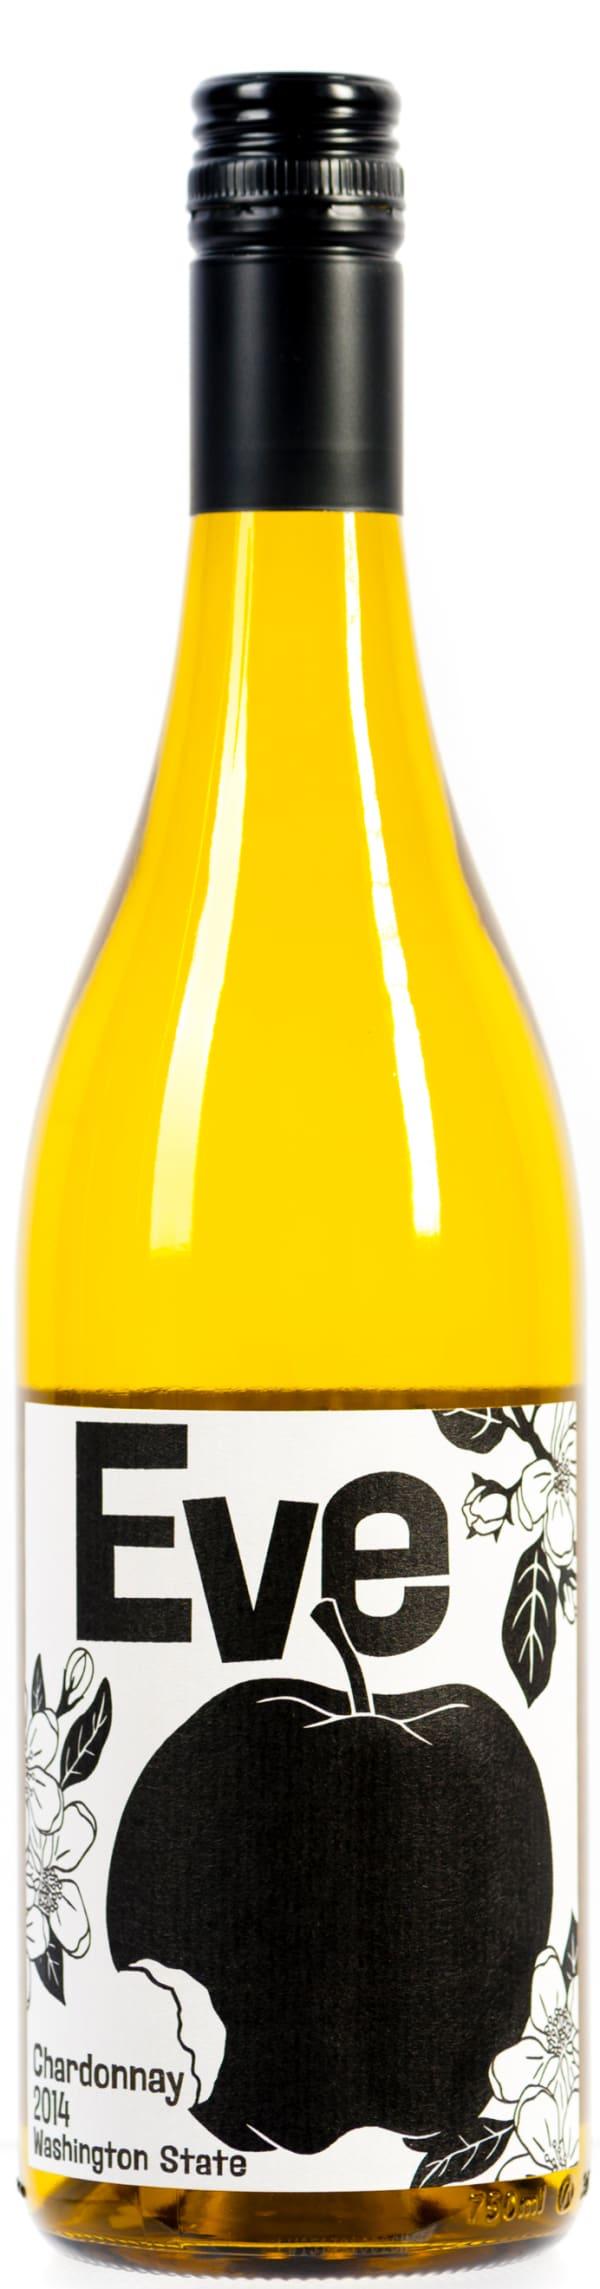 Eve Chardonnay 2016